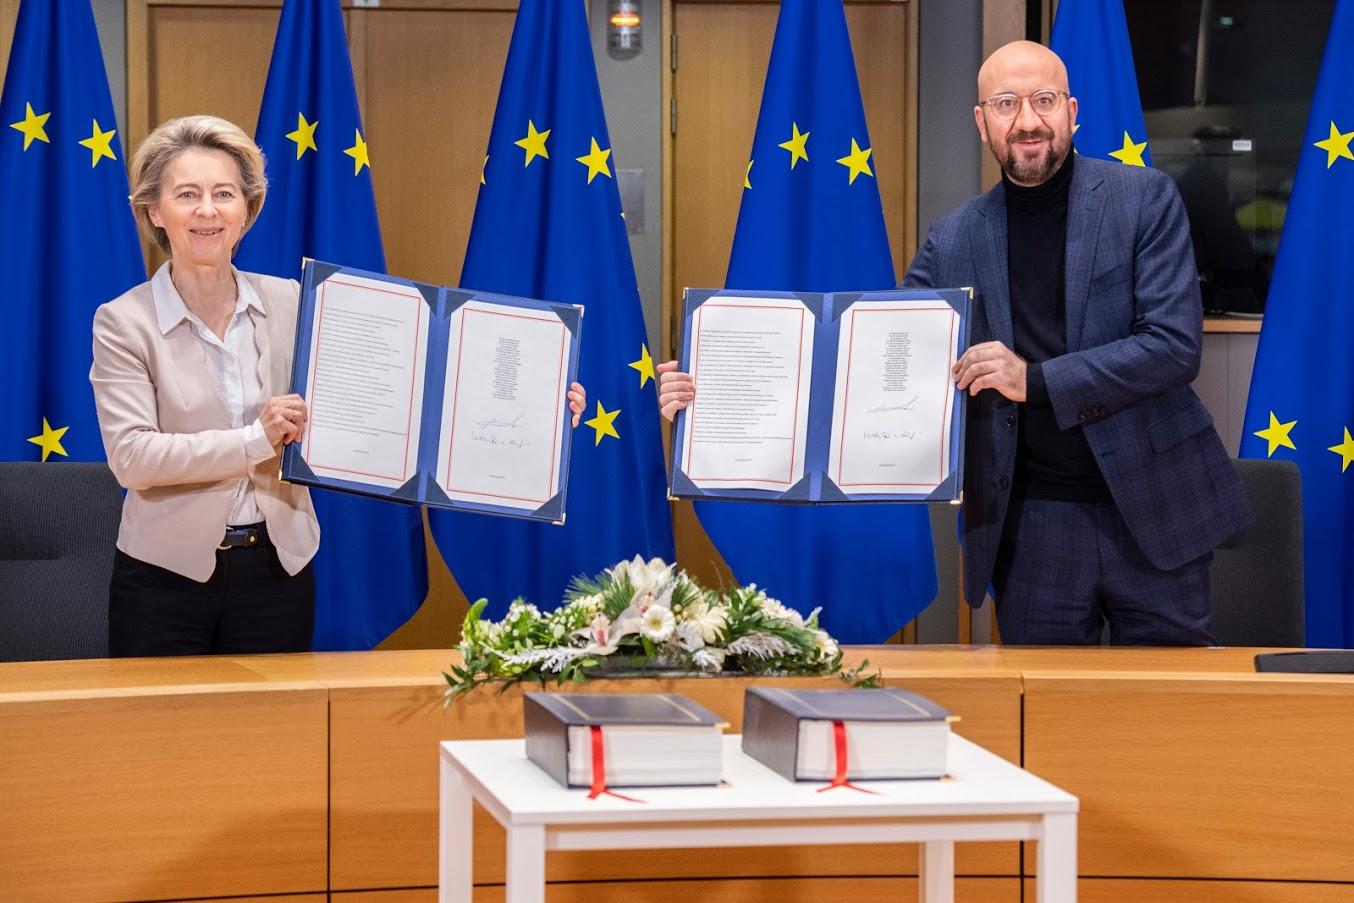 Firma dell'accordo UE-UK da parte di U. Von Der Leyen e C. Michel